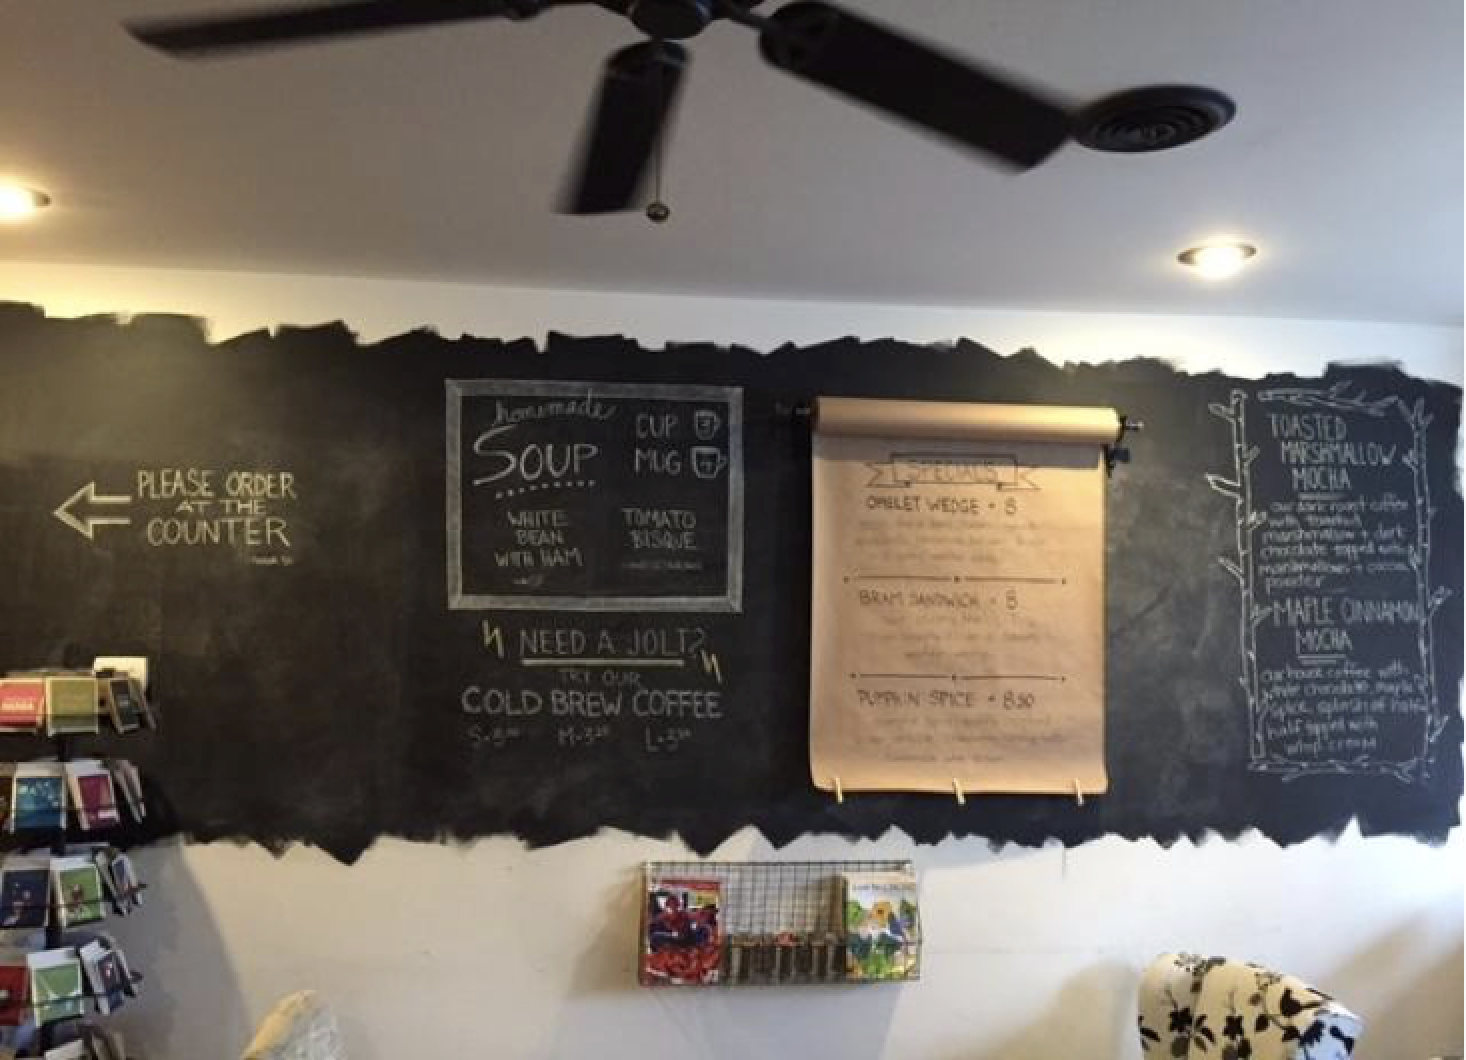 The old chalkboard wall.